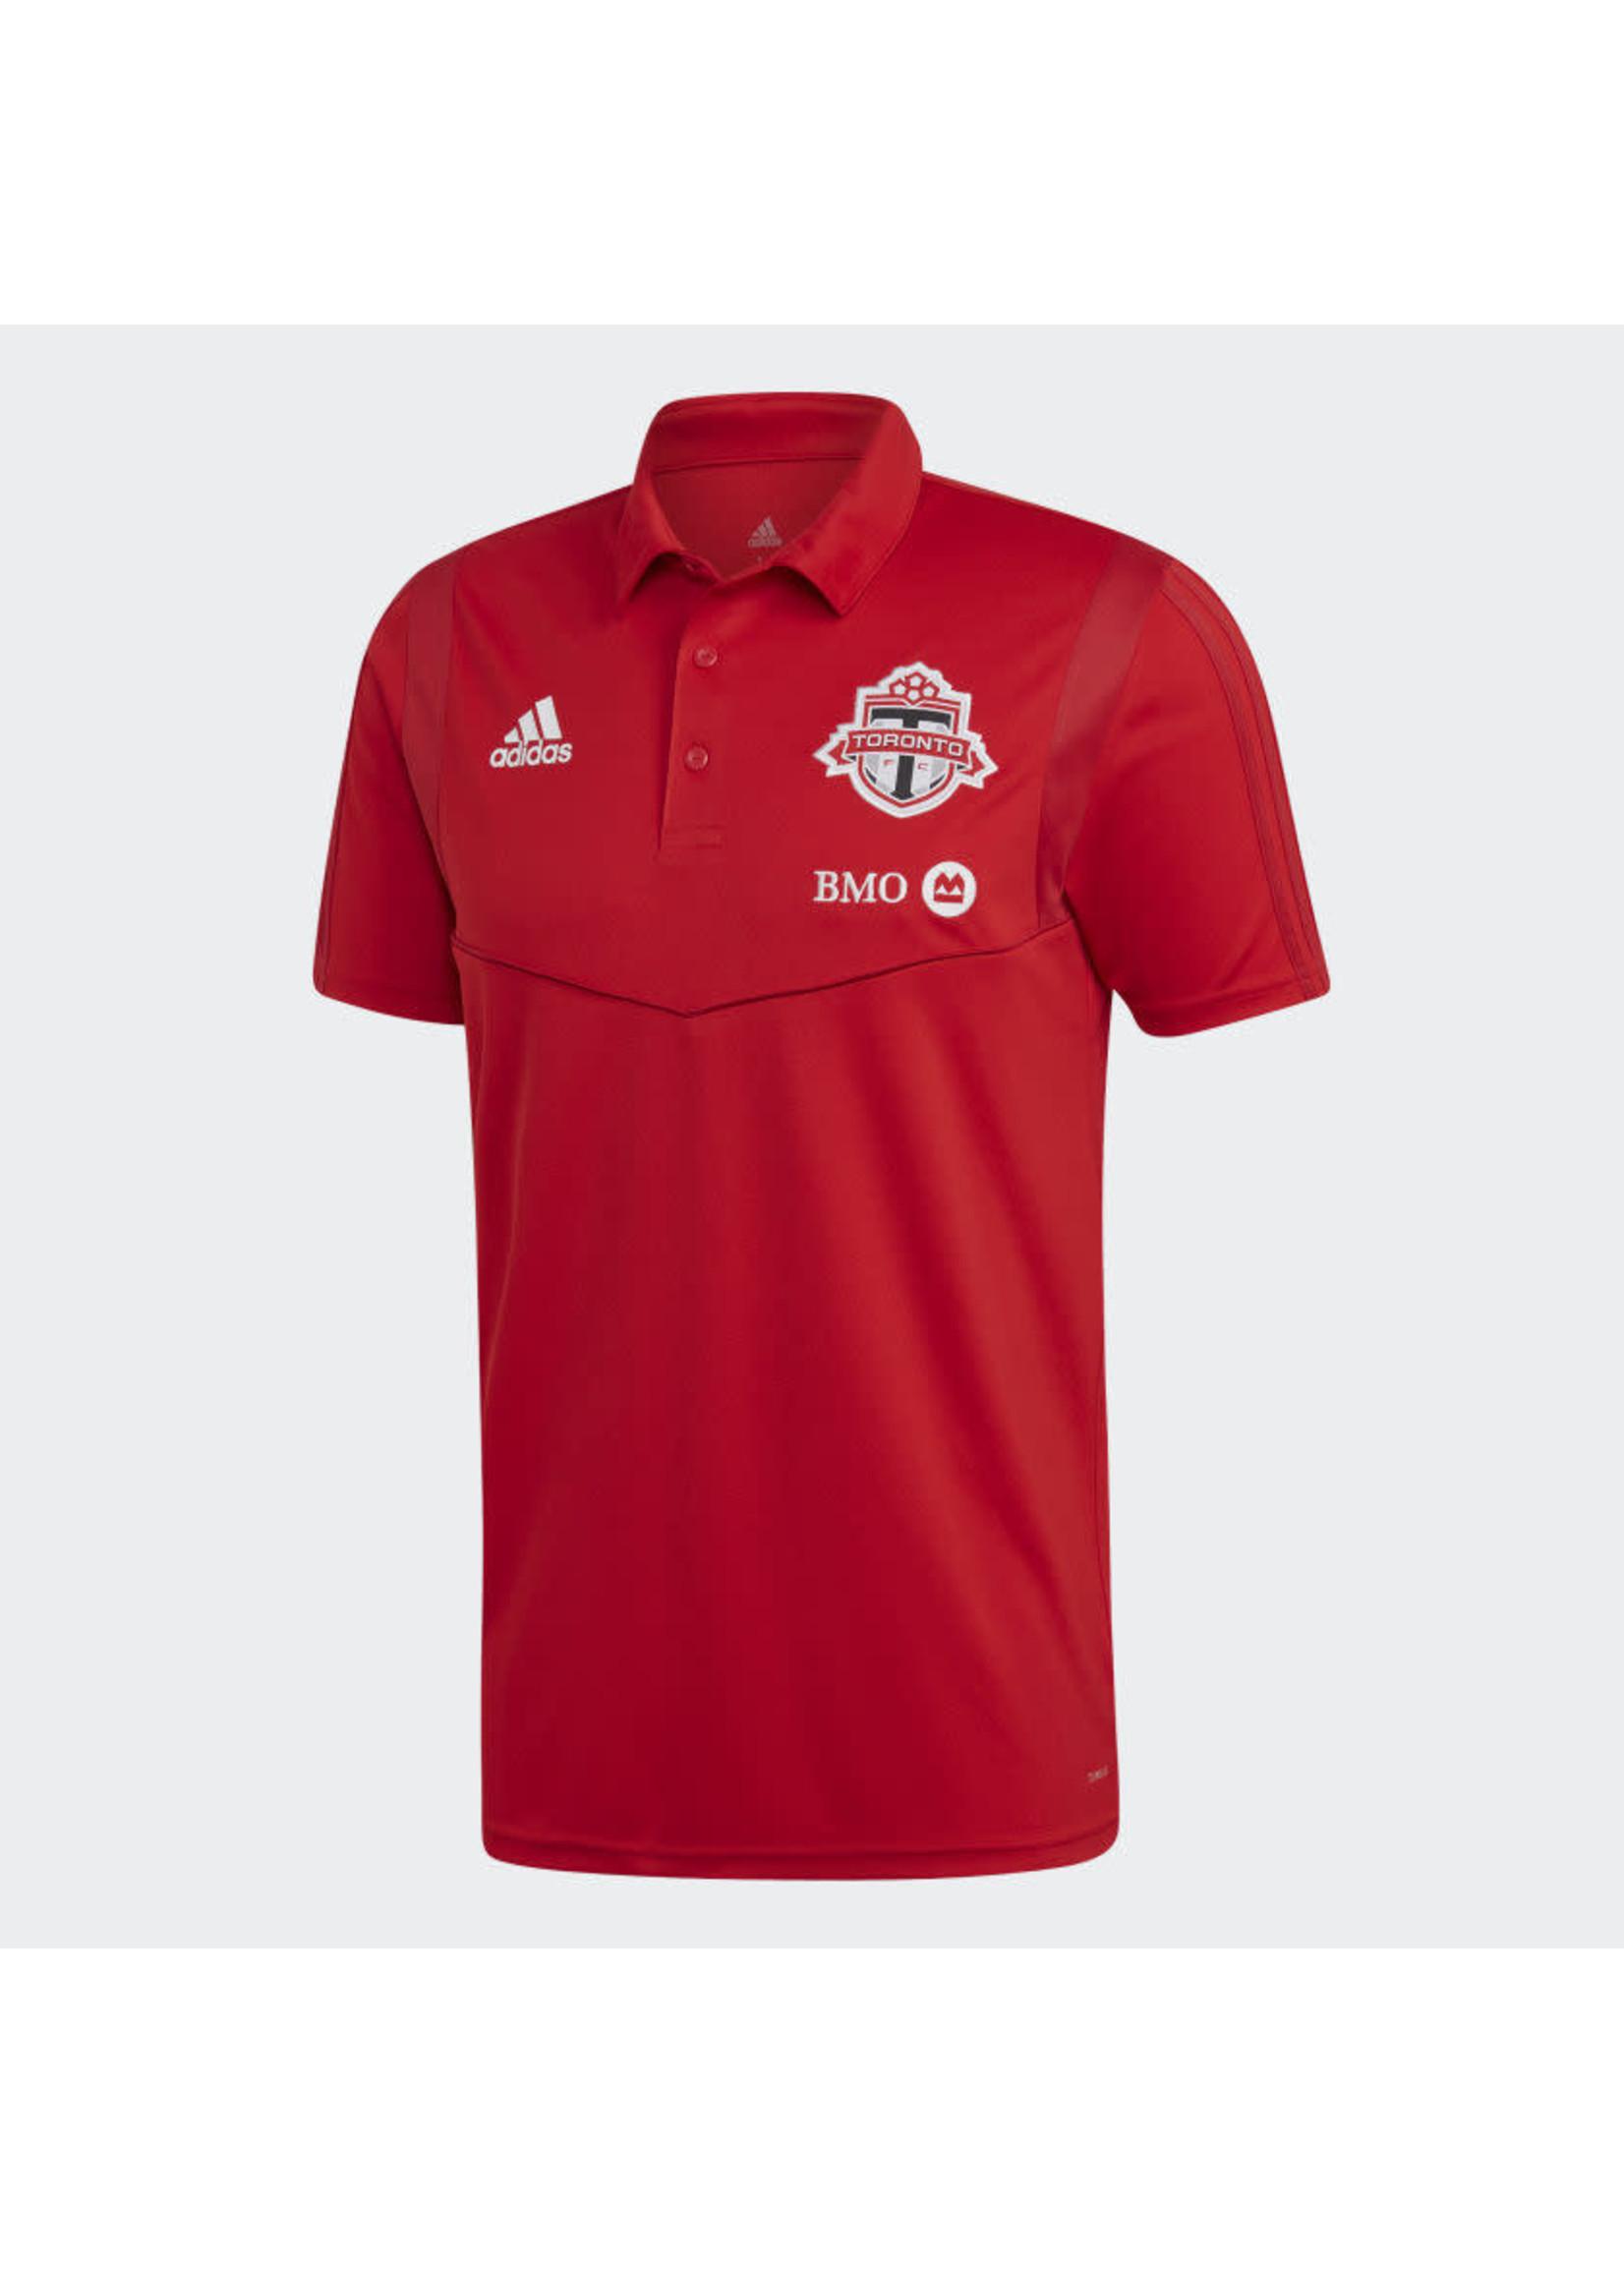 Adidas Toronto Polo Shirt - Red